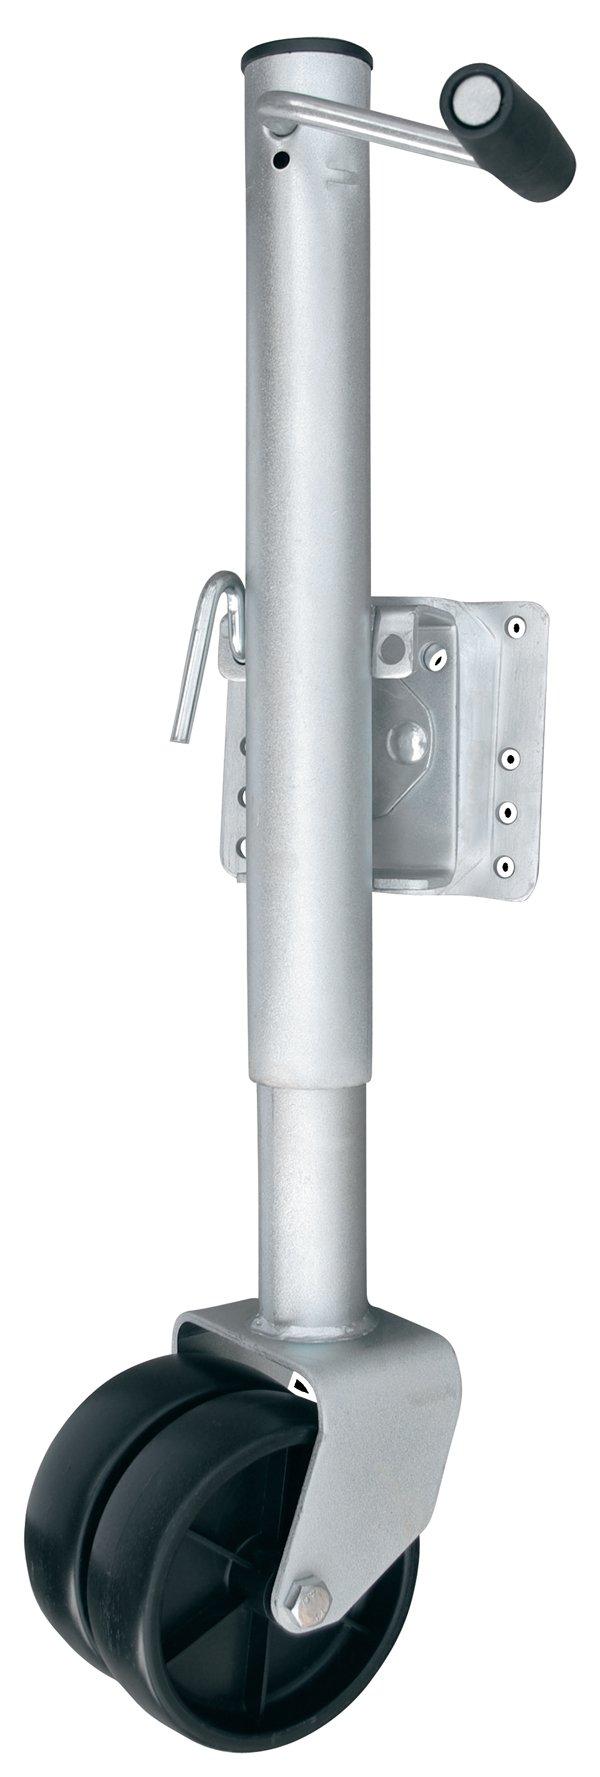 attwood Swing-Up Swivel Tongue Jack (1500-Pound)